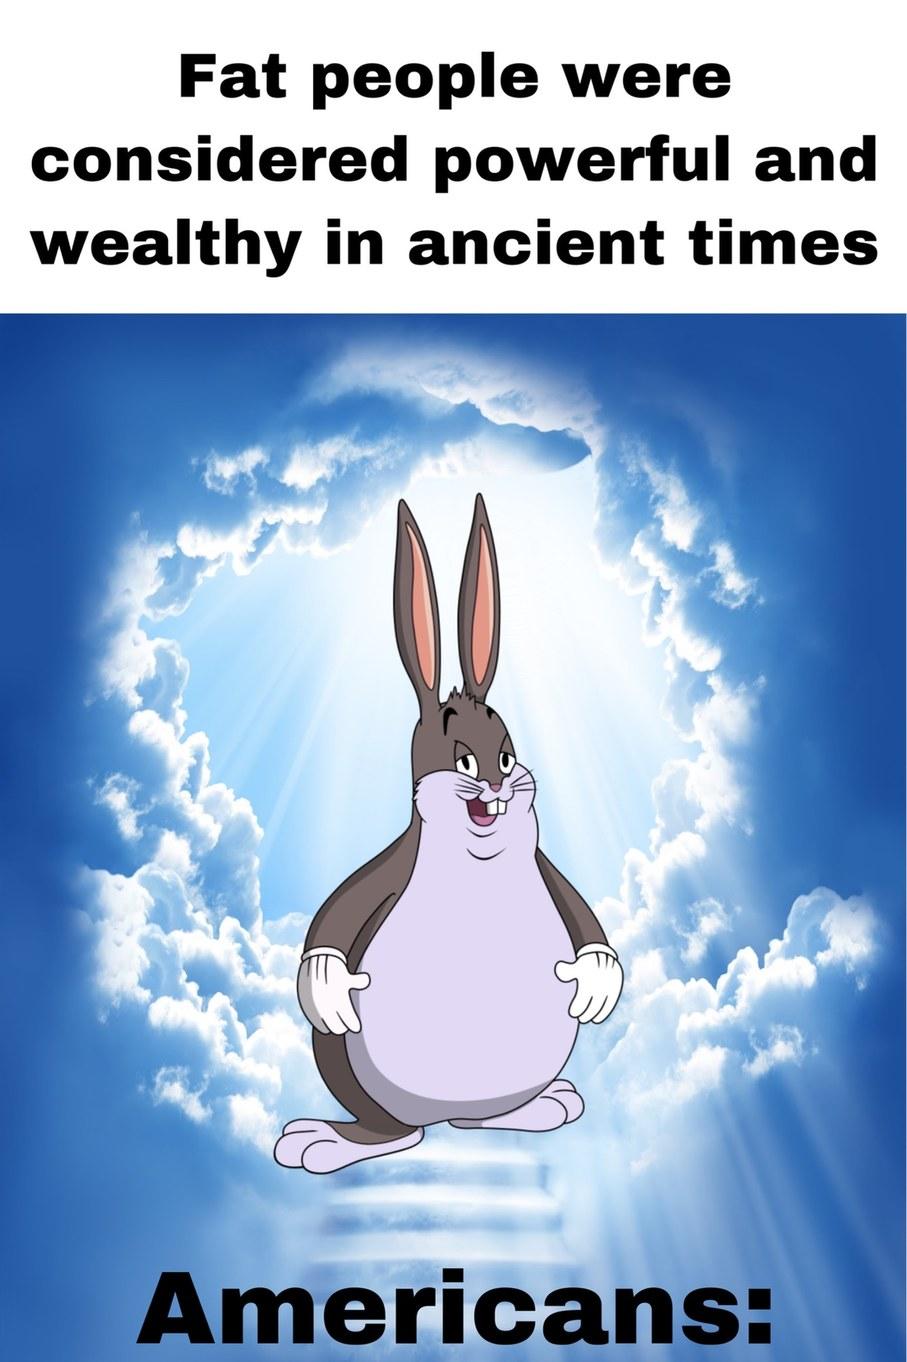 Praise the Thiccest - meme